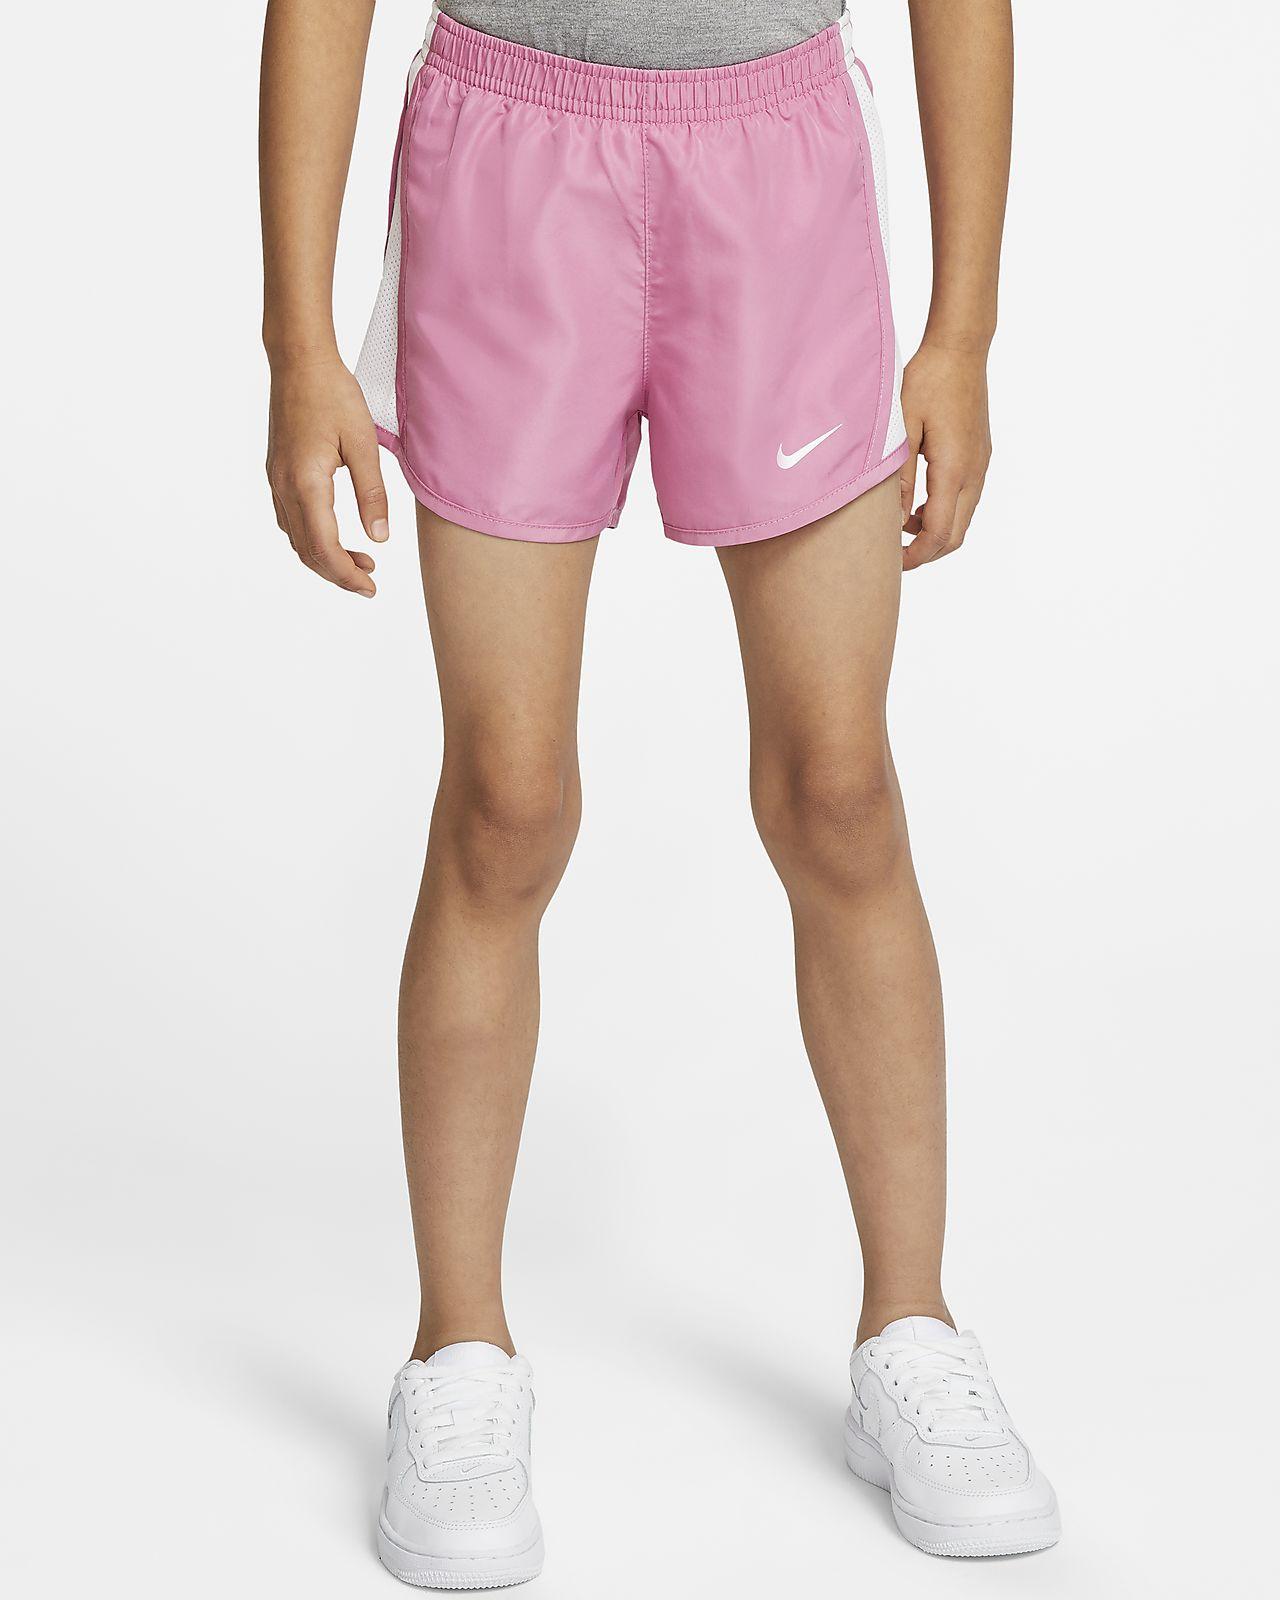 Nike Dri-FIT Tempo Little Kids' Running Shorts